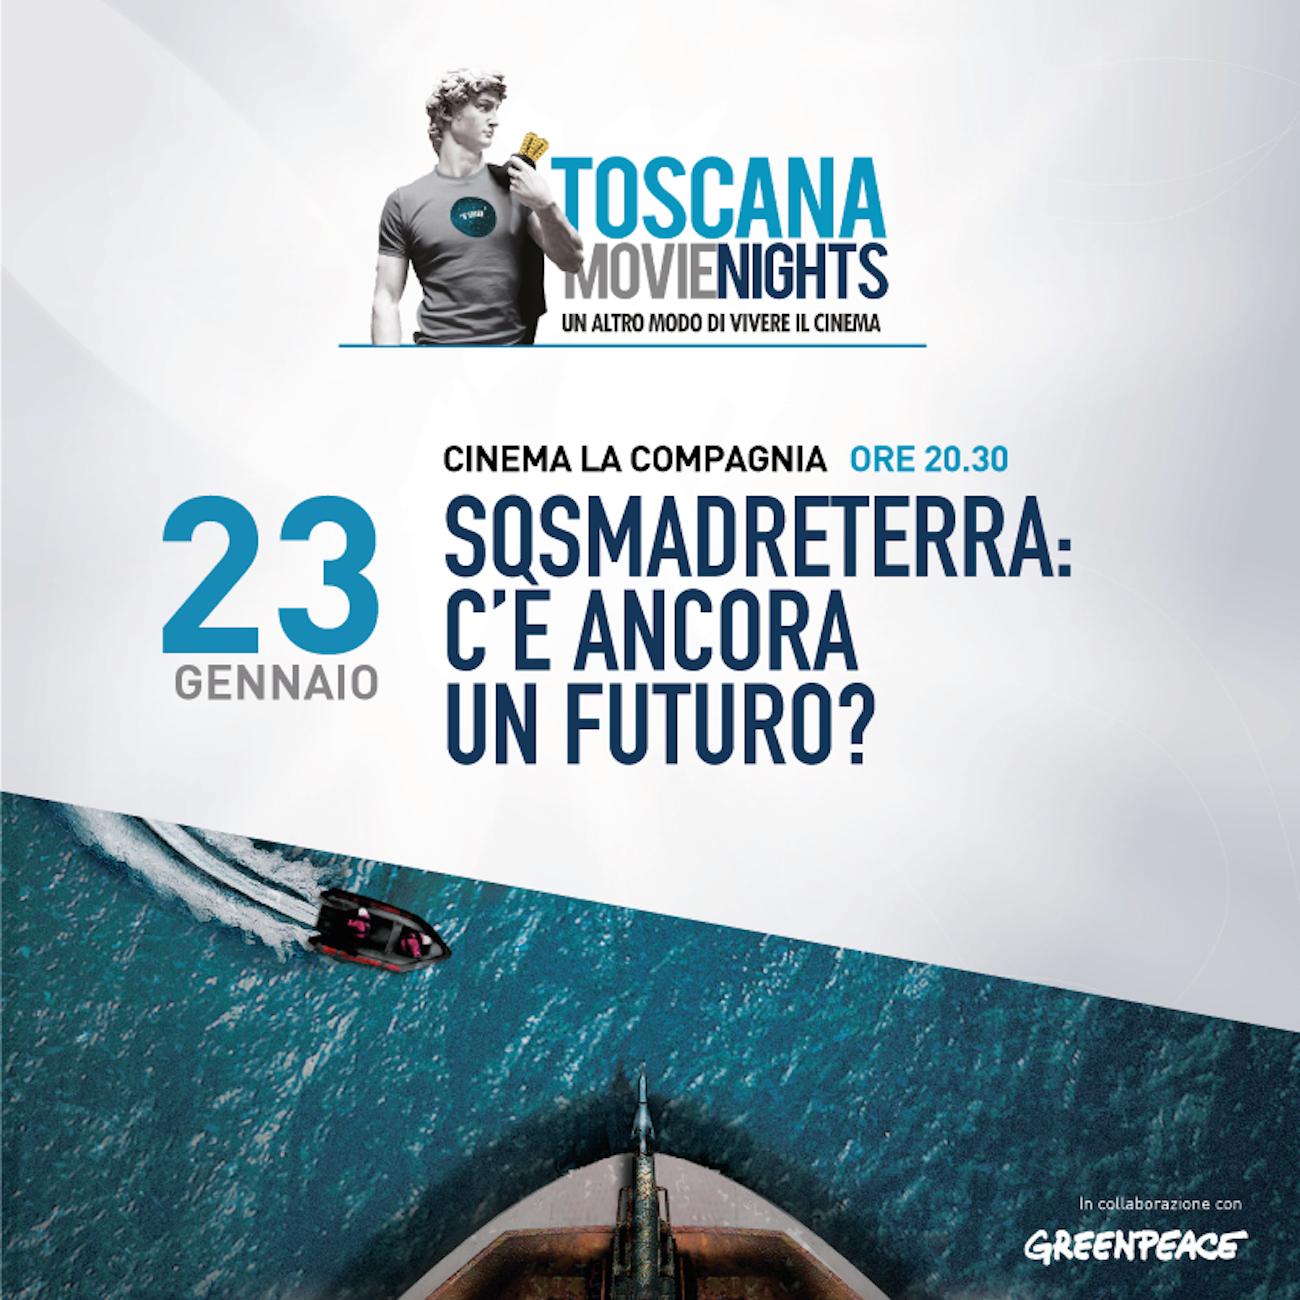 Toscana Movie Nights